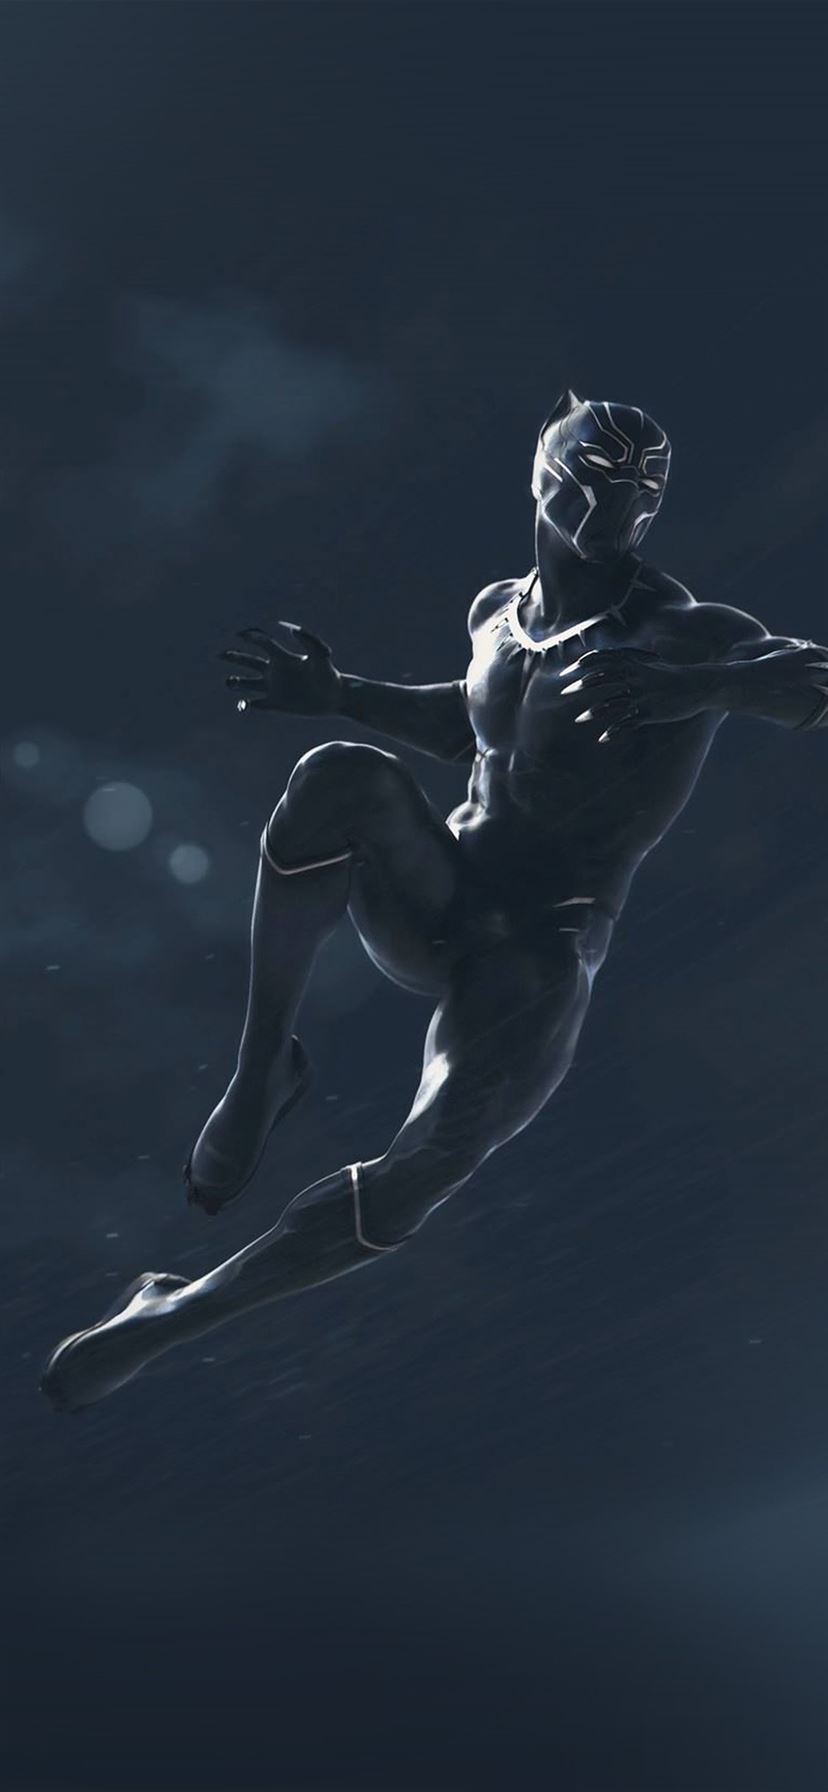 Marvel Black Panther Dark Art Illustration Iphone 11